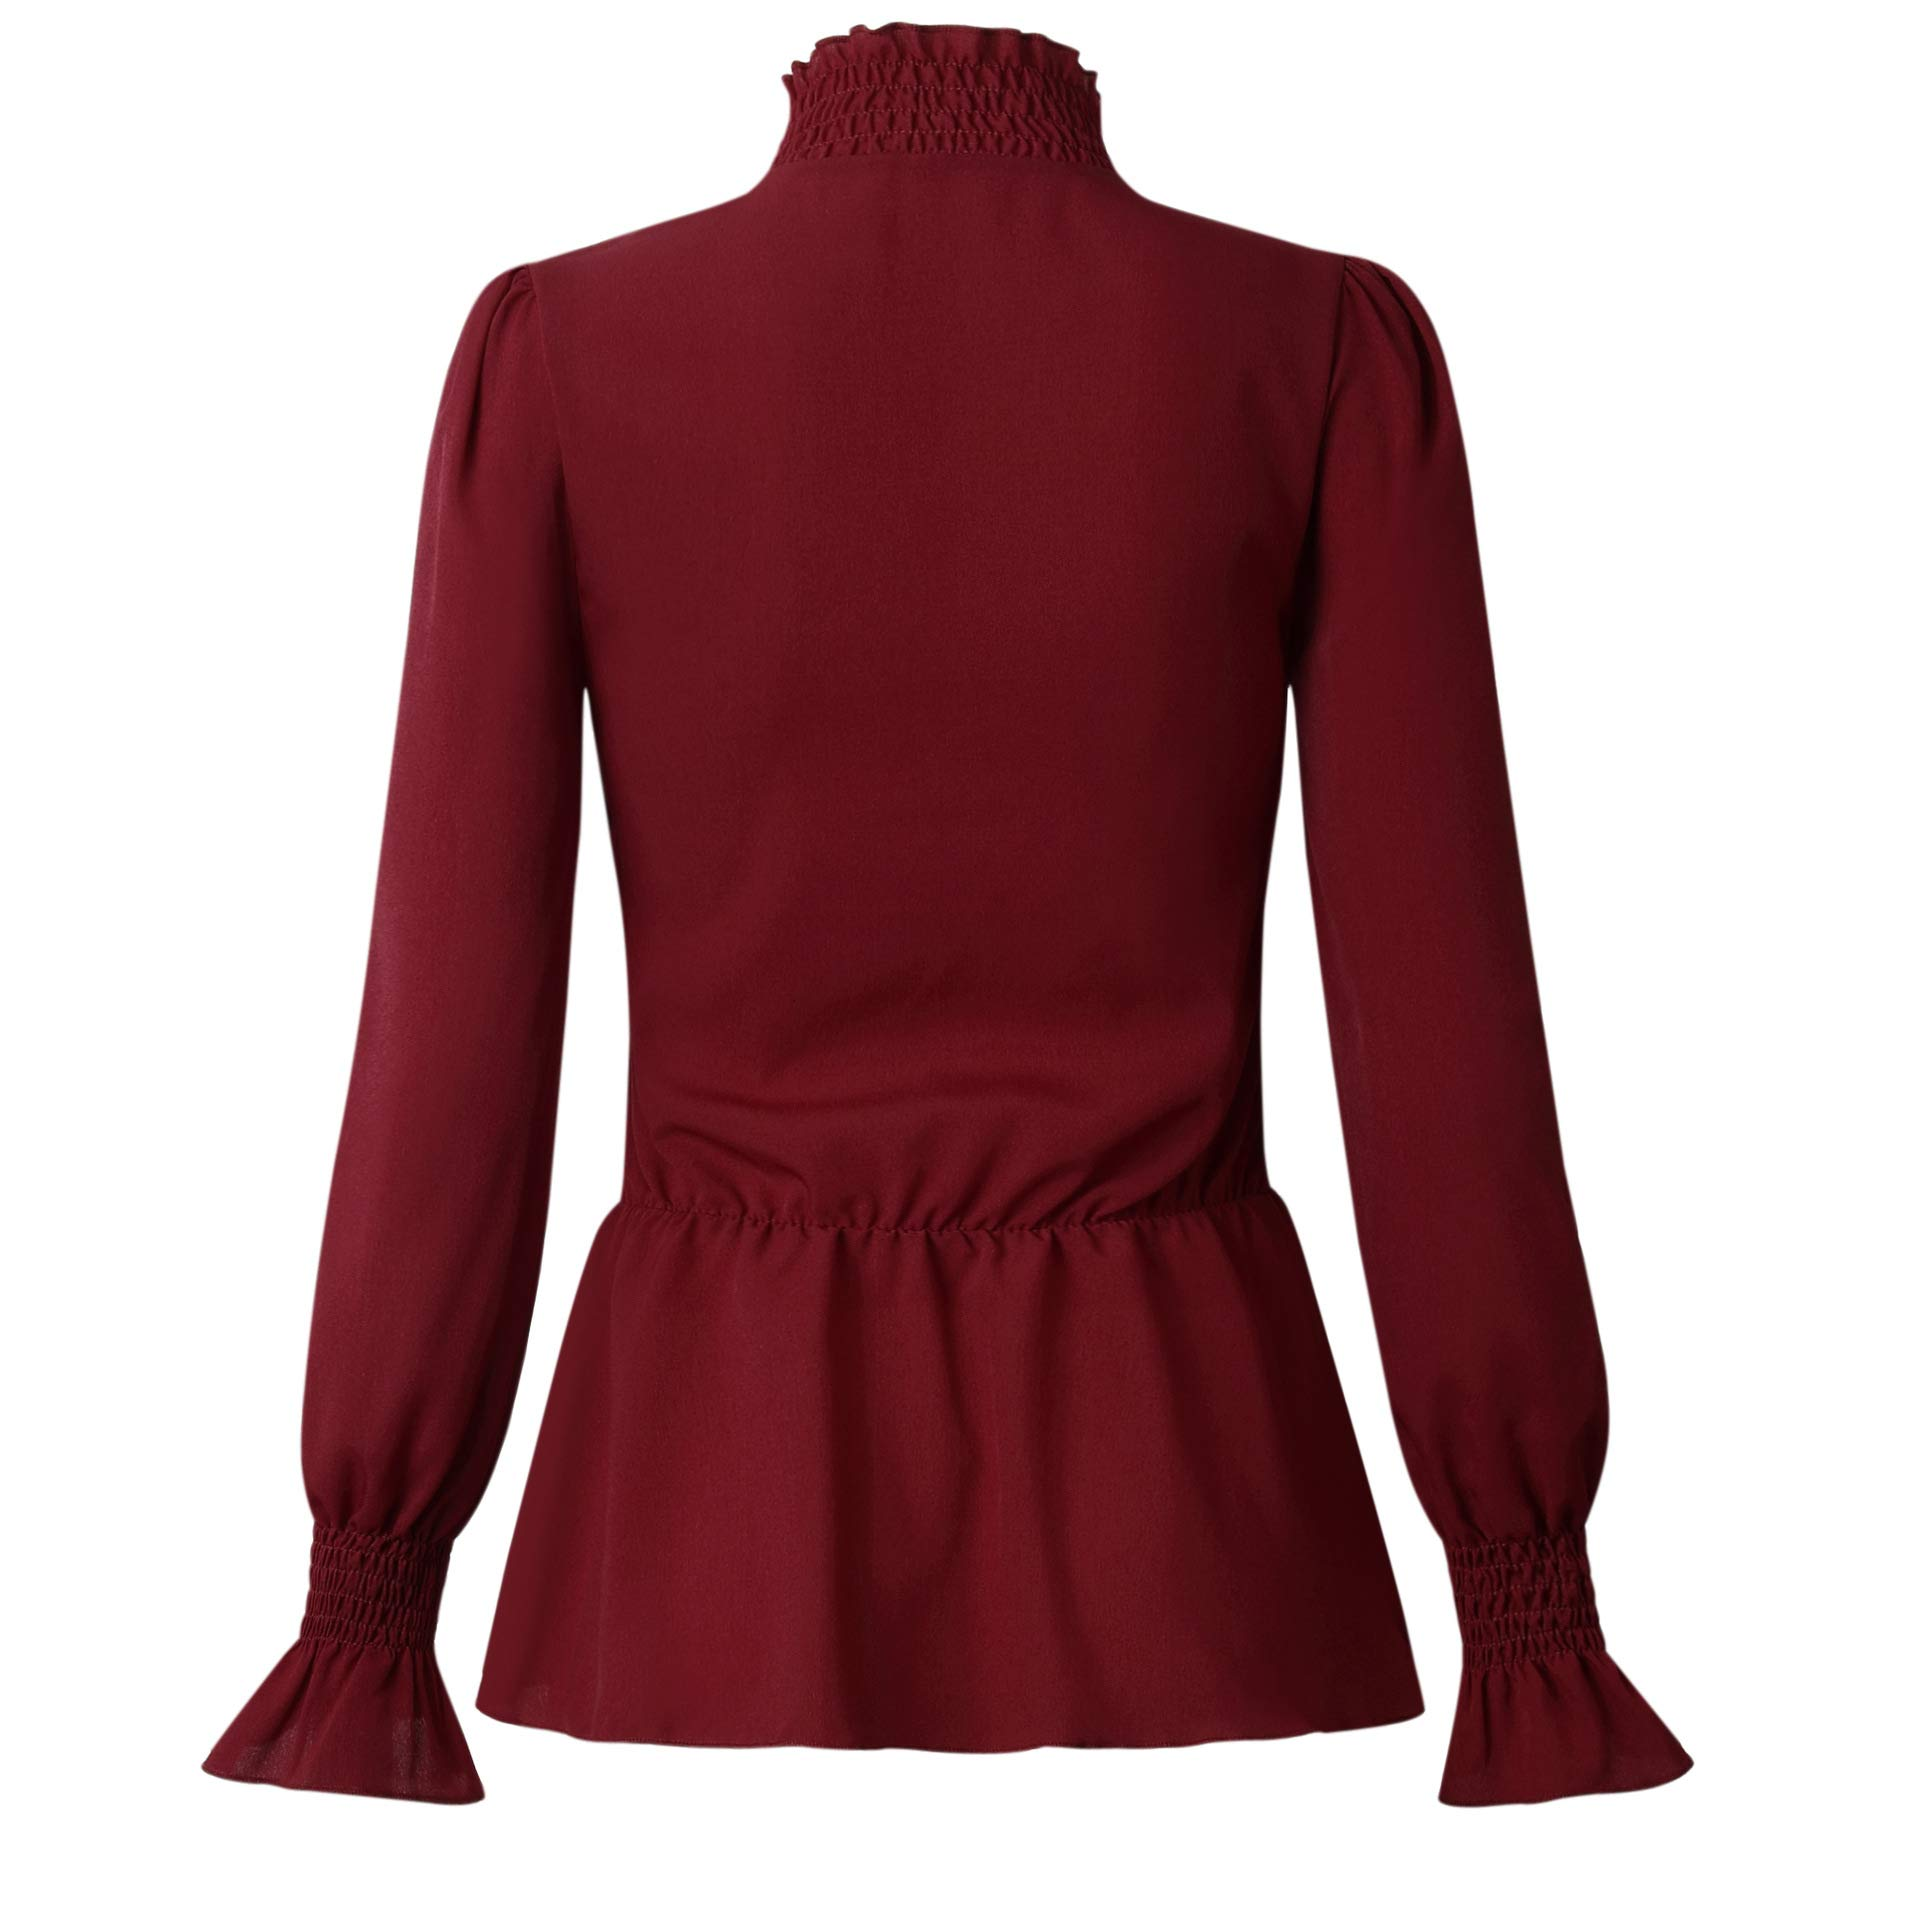 ThusFar Women\'s Peplum Dressy Tunic Tops - Elegant Ruffle Bell Sleeve Sweater X-Large Wine Red